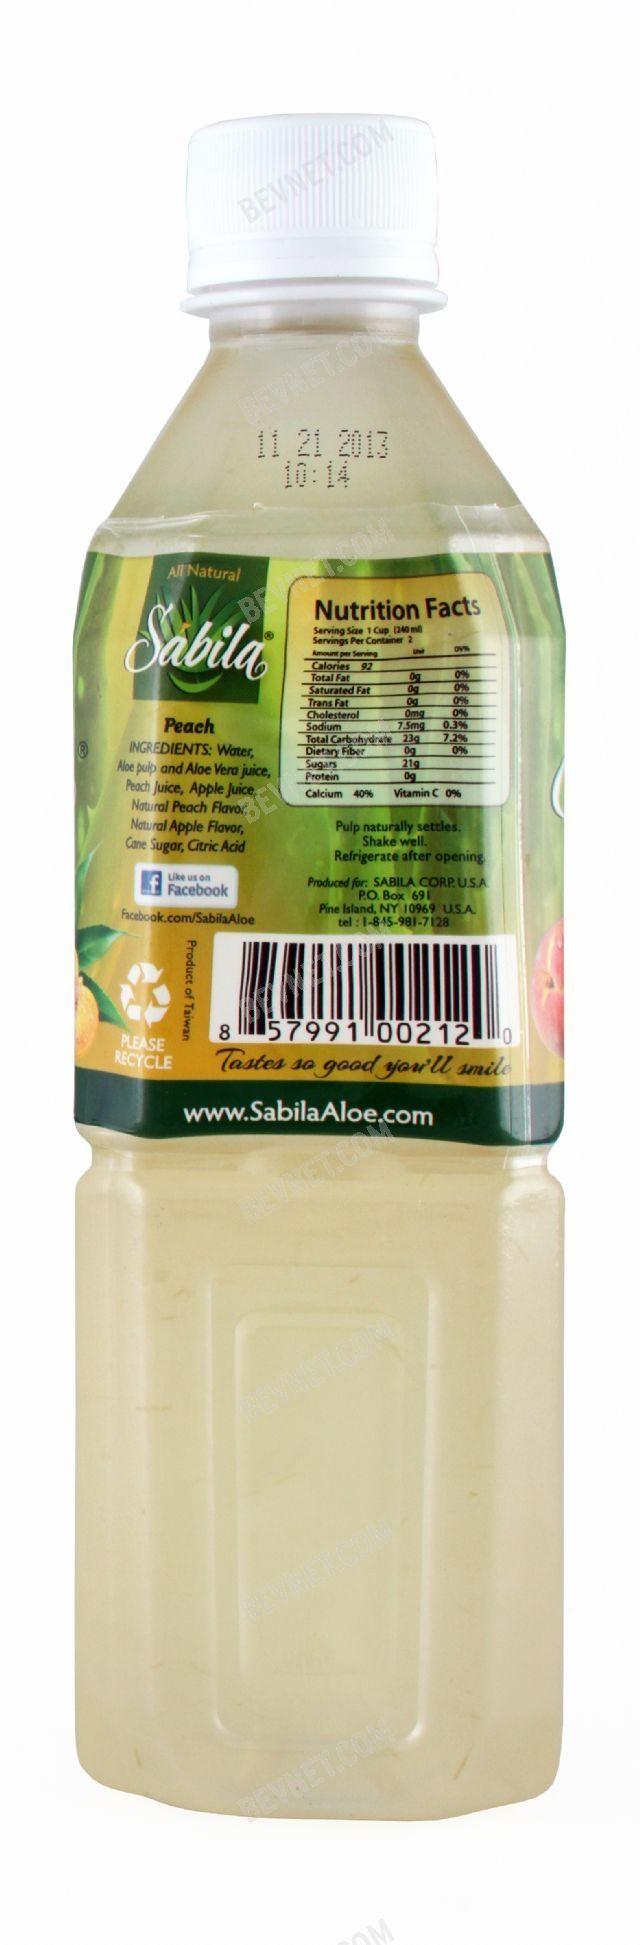 Sabila Aloe Drink: